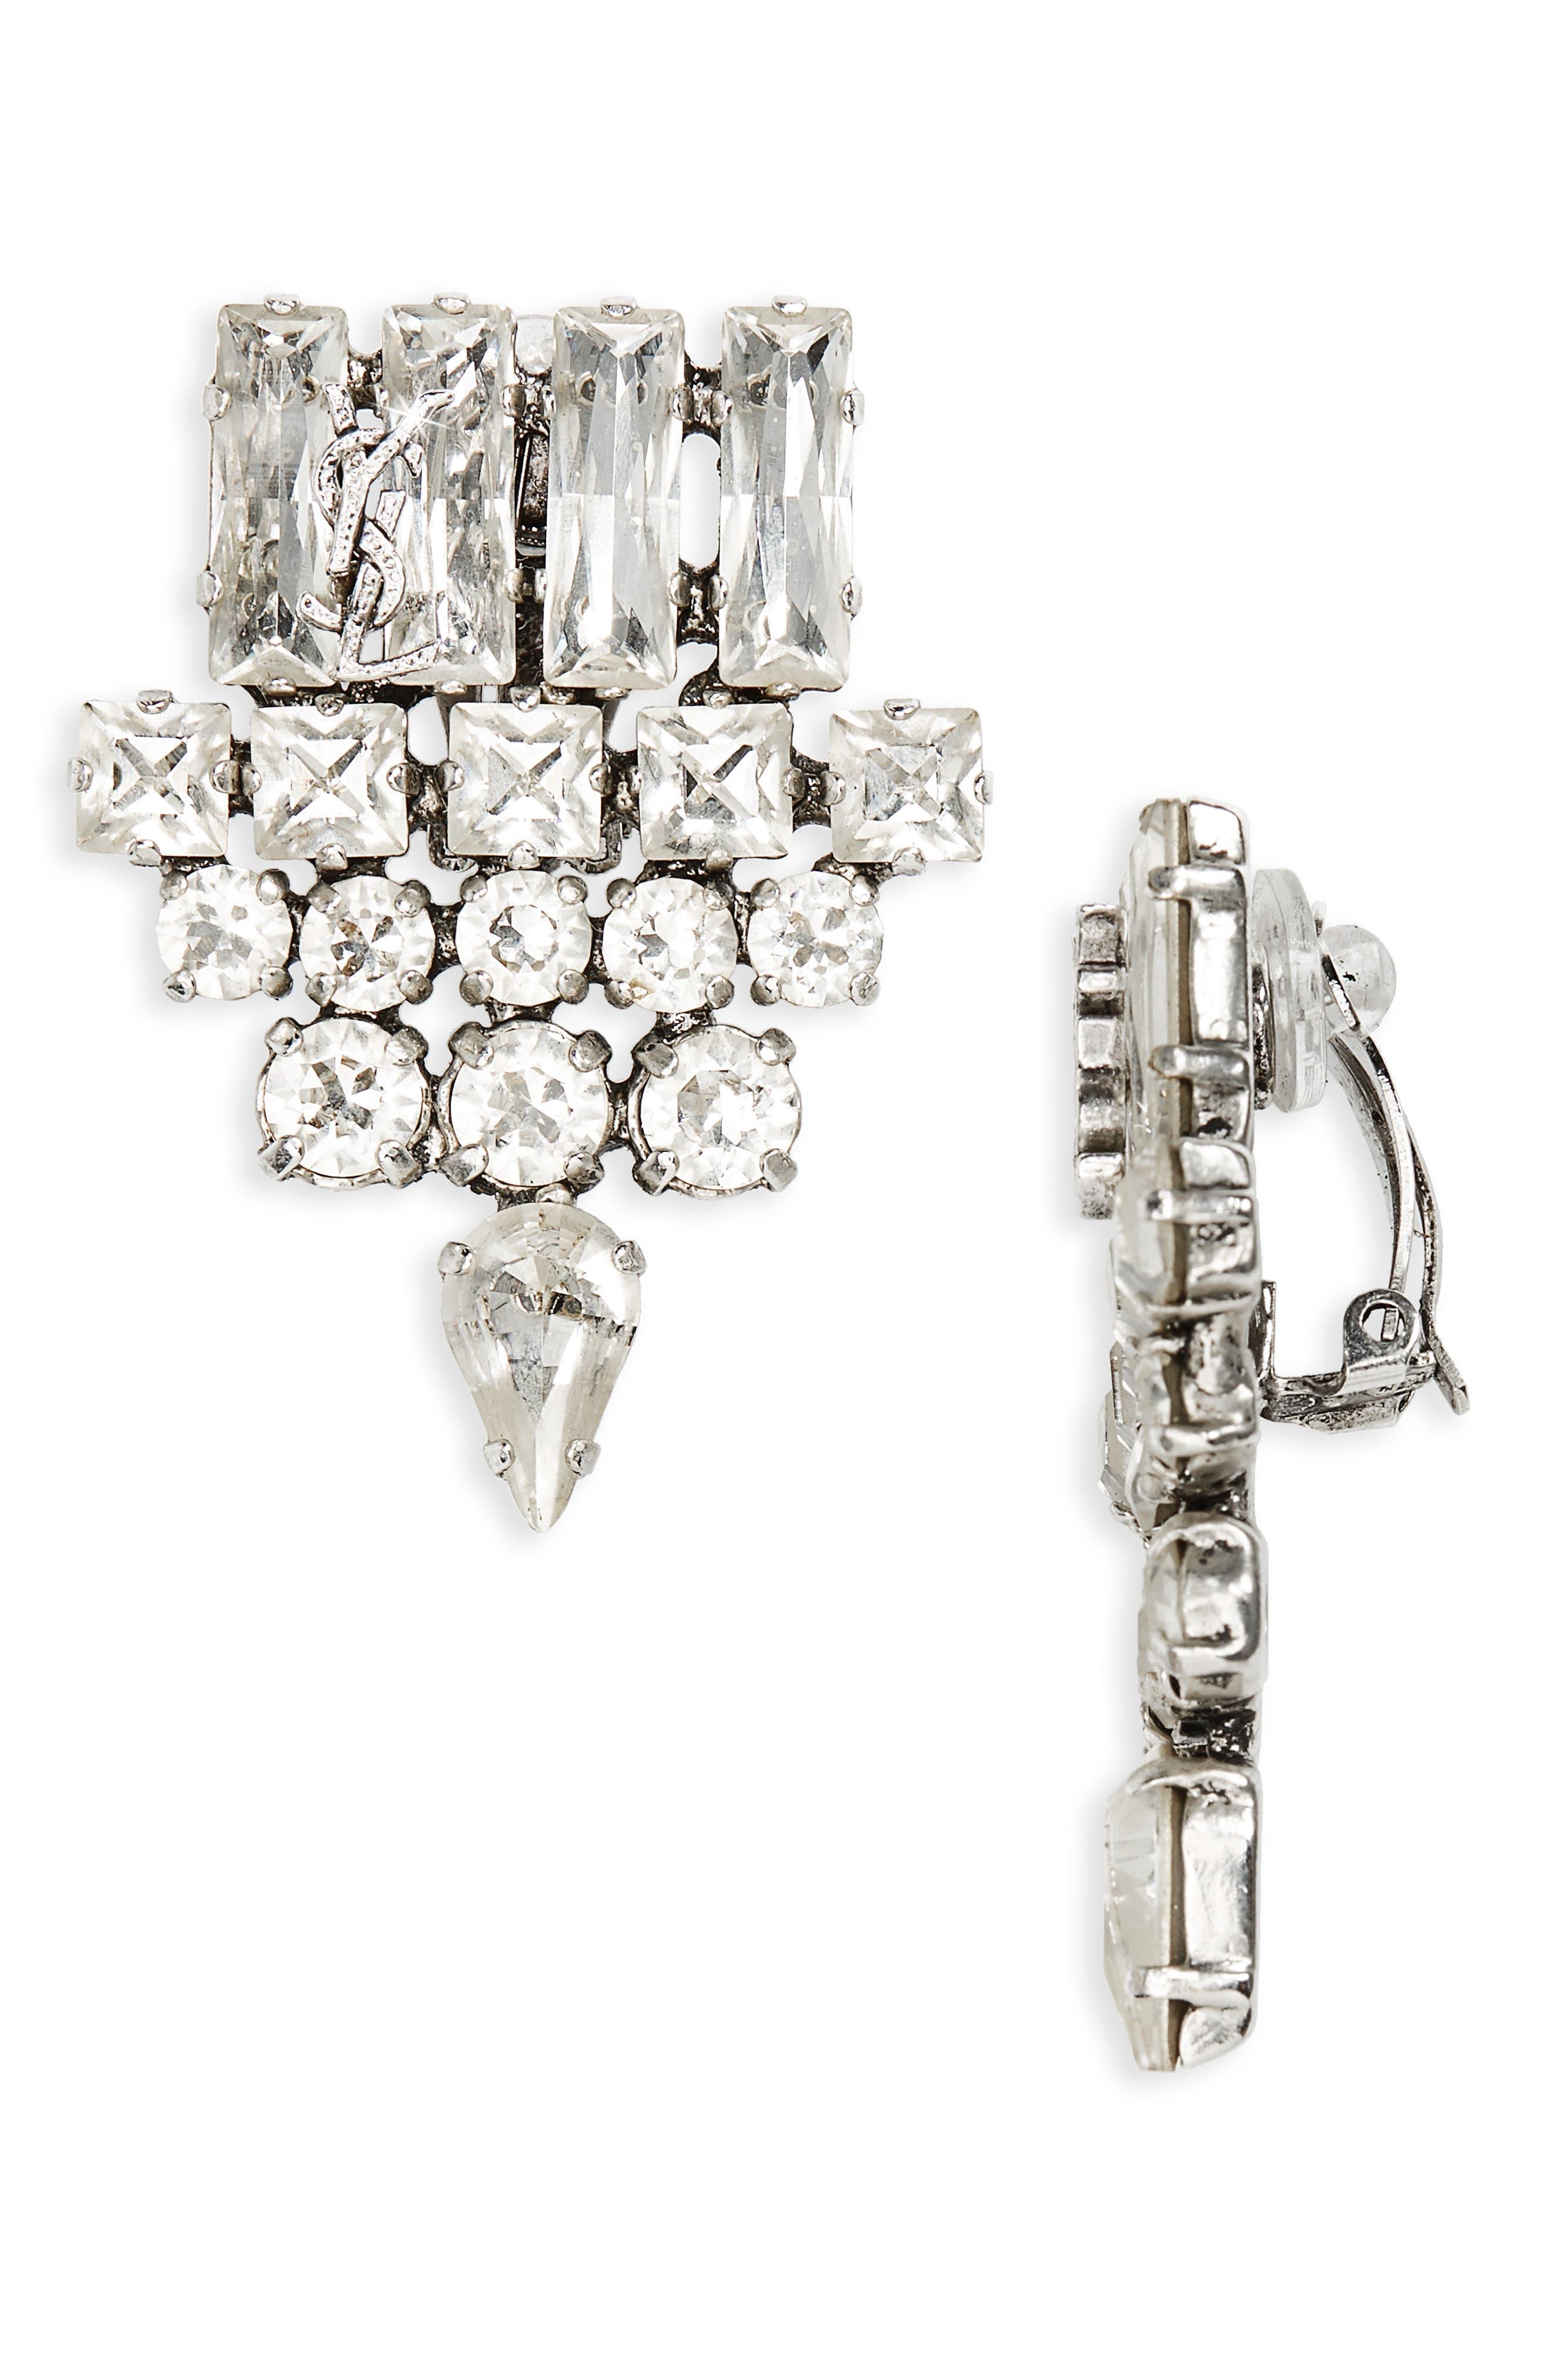 Smoking Glass Crystal Clip-On Earrings,                             Main thumbnail 1, color,                             Crystal